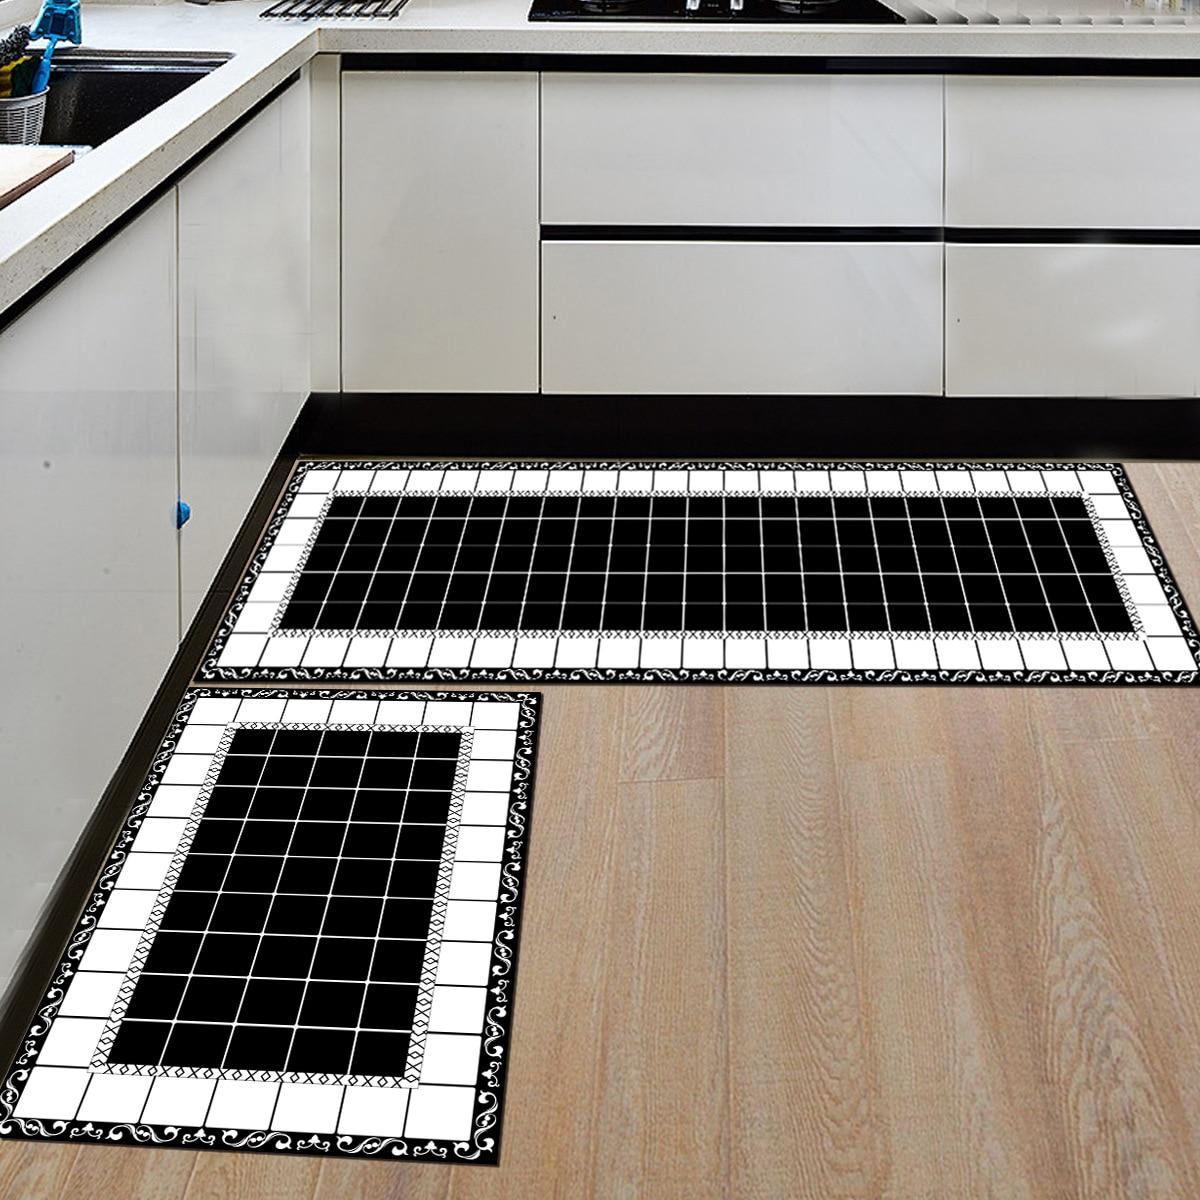 Black And White Flannel Floor Mats For Kitchen Anti-Slip Kids Bedroom Carpet Entrance/Hallway Area Rug